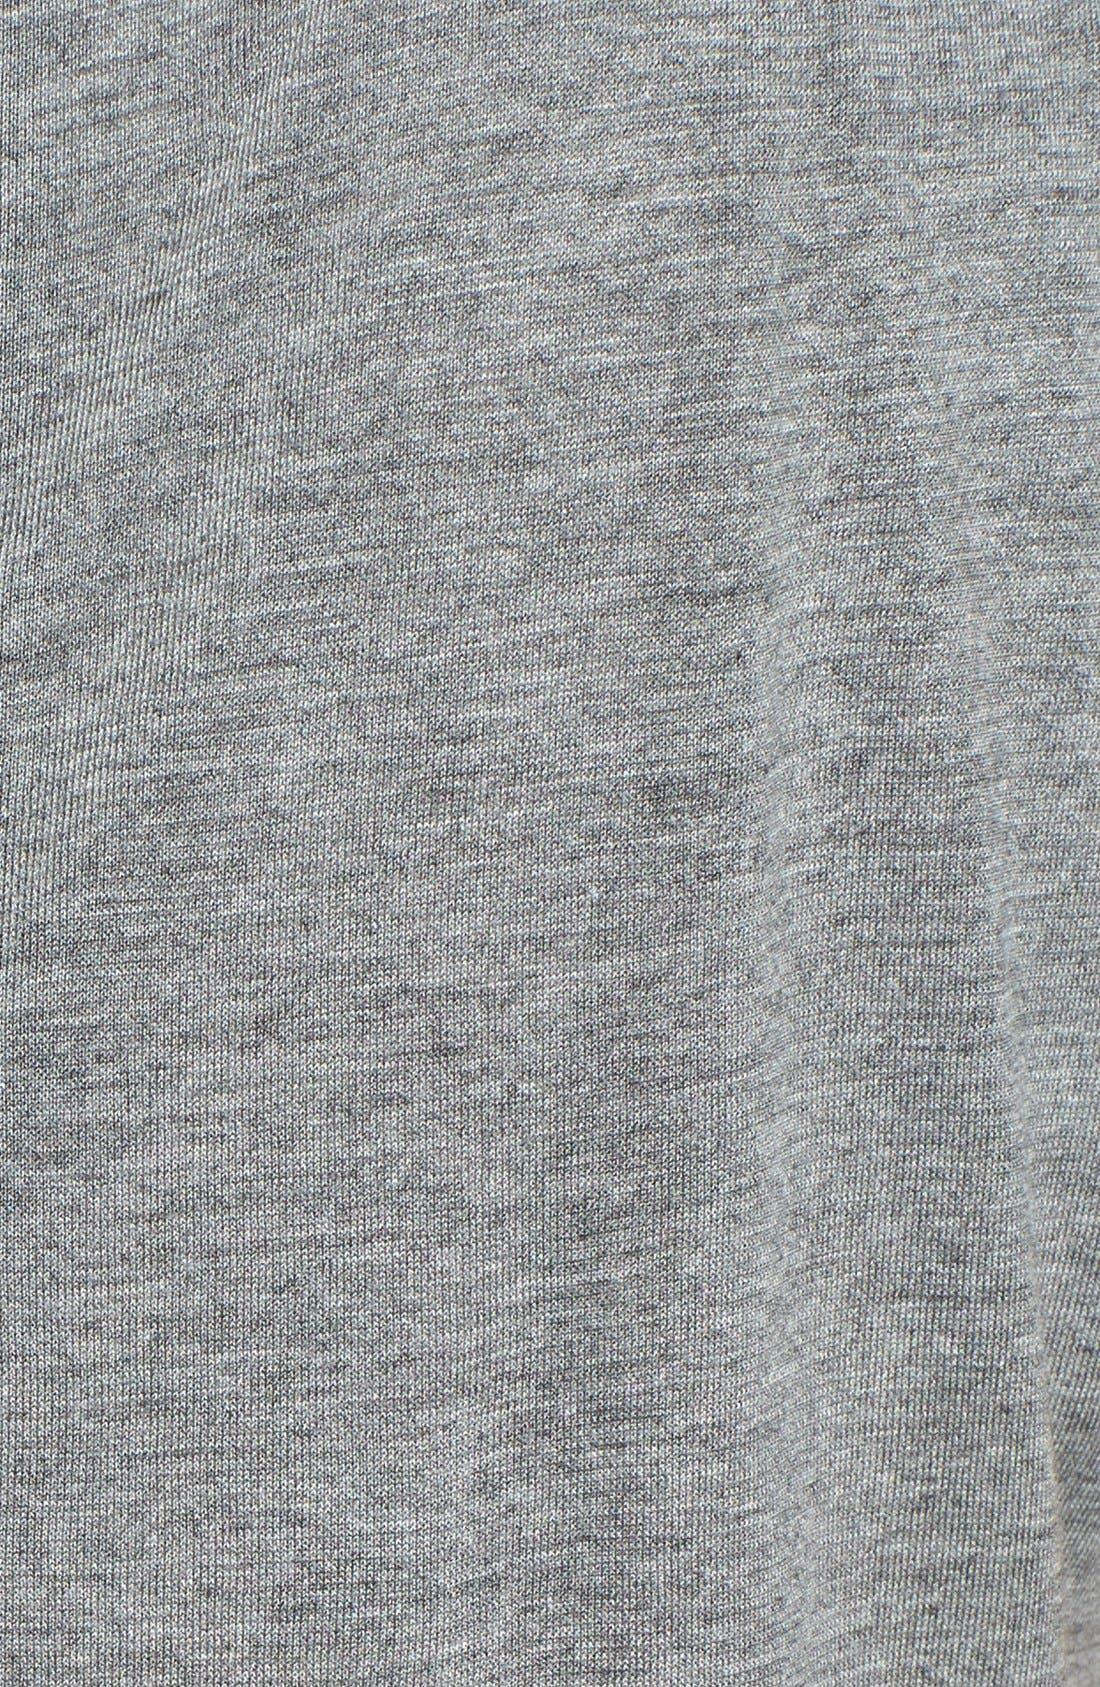 Alternate Image 3  - Two by Vince Camuto Embellished Jersey & Chiffon Tank